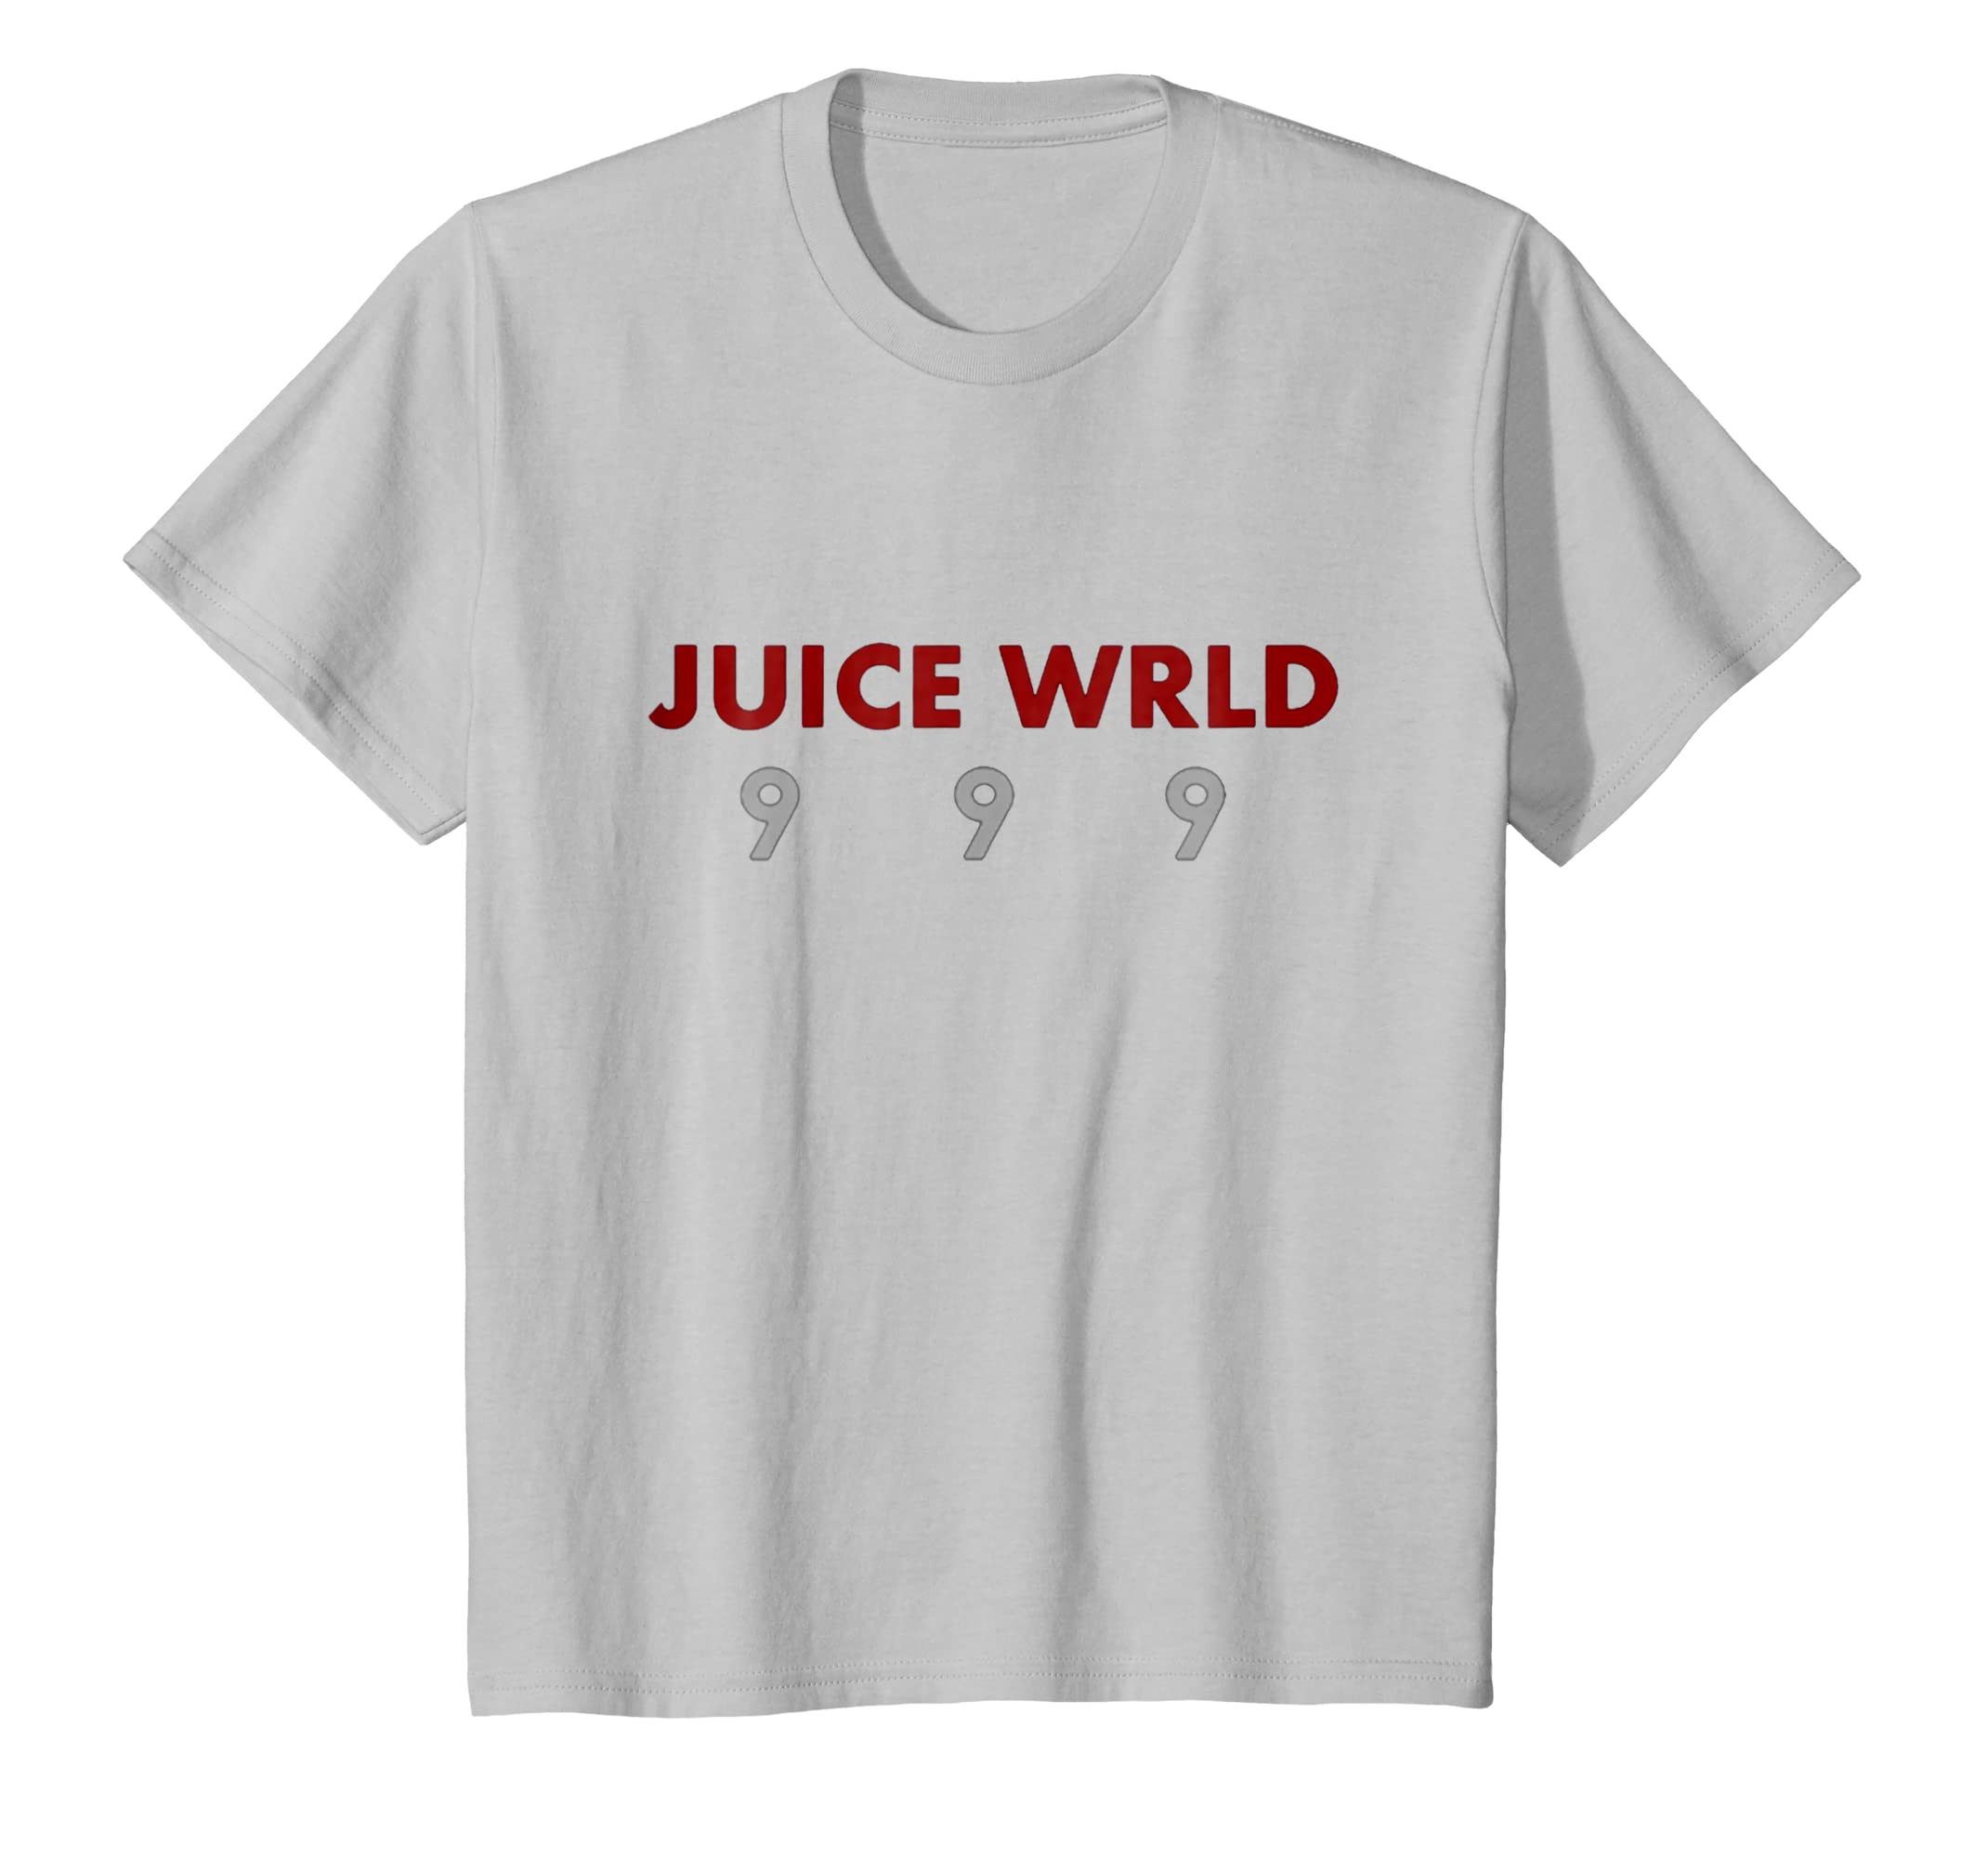 787099dfc Amazon.com: Juice WRLD 9 9 9 T Shirt For Mens Womens: Clothing